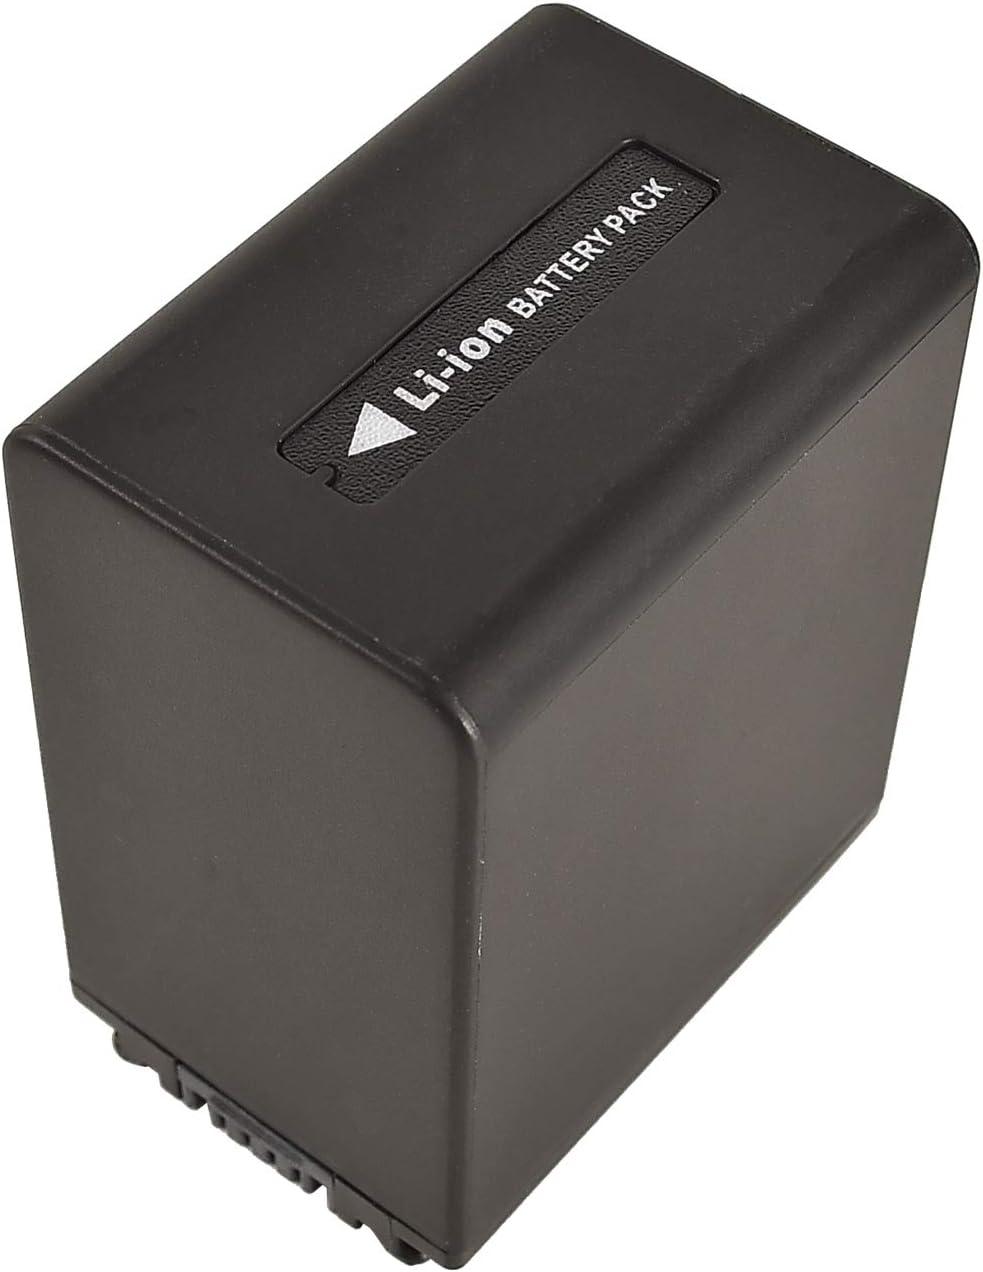 Dual-Ladeger/ät USB kompatibel mit Sony HDR-CX230 HDR-CX260V HDR-CX290 HDR-CX300 HDR-CX305 HDR-CX350V HDR-CX360V HDR-CX380 DSTE 2-St/ück Ersatzakku Set NP-FV100 Batterie